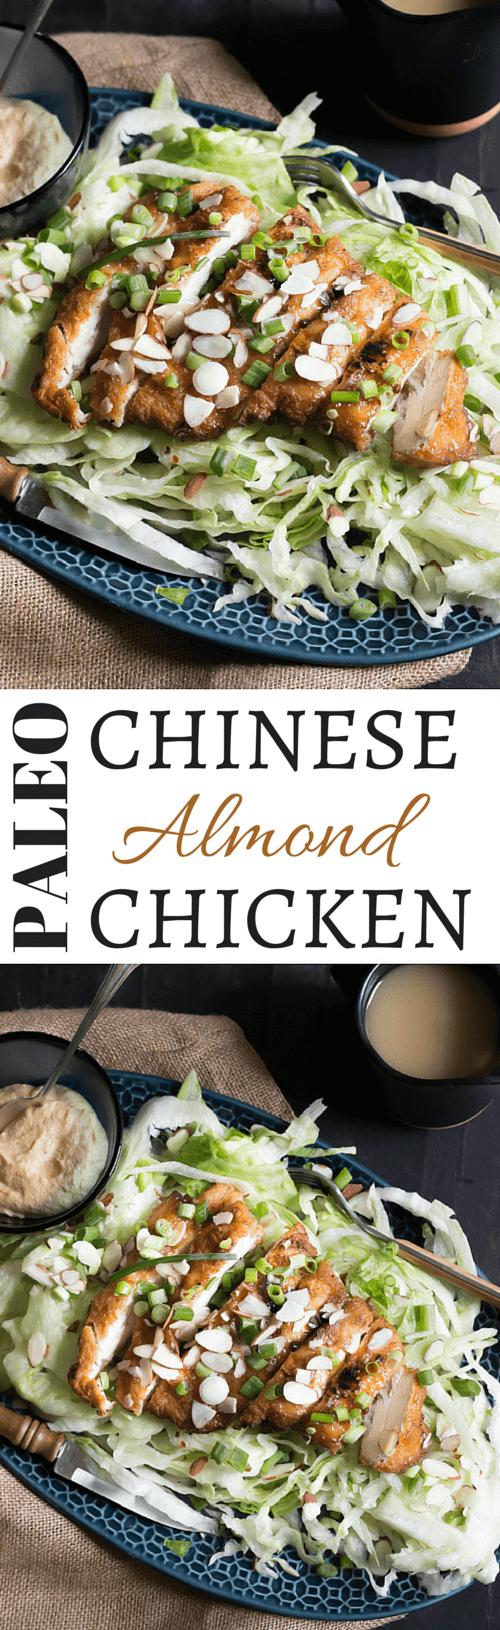 Paleo Chinese Almond Chicken | Crispy tempura chicken covered in almond gravy - wickedspatula.com